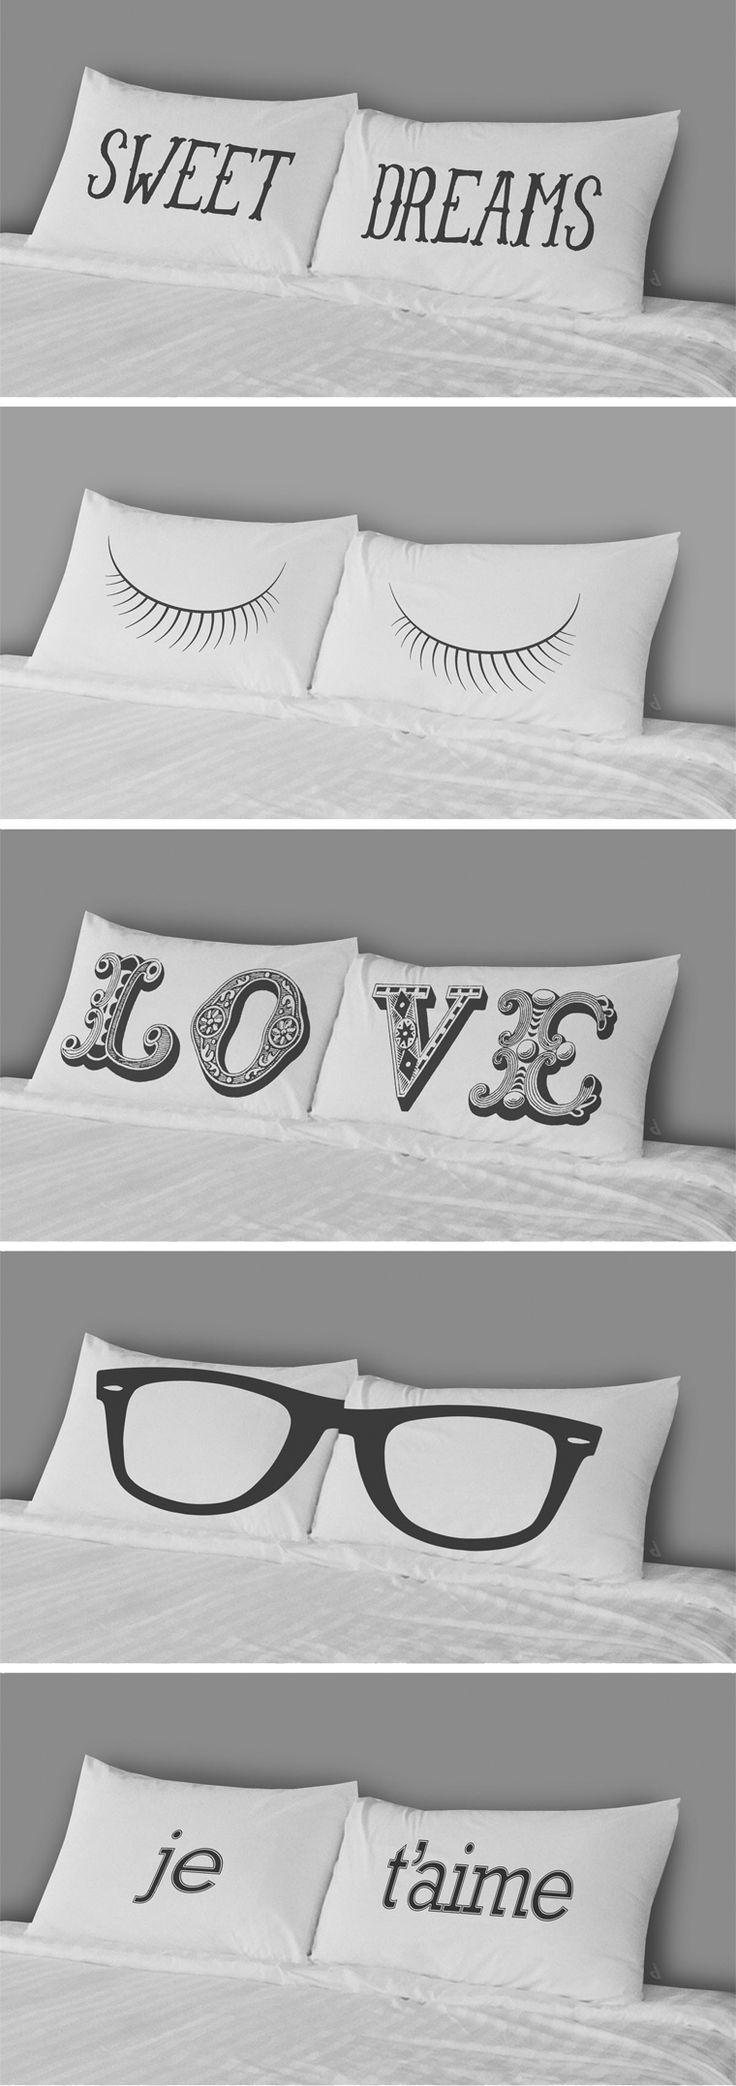 Sweet Dreams // fun pillowcase designs